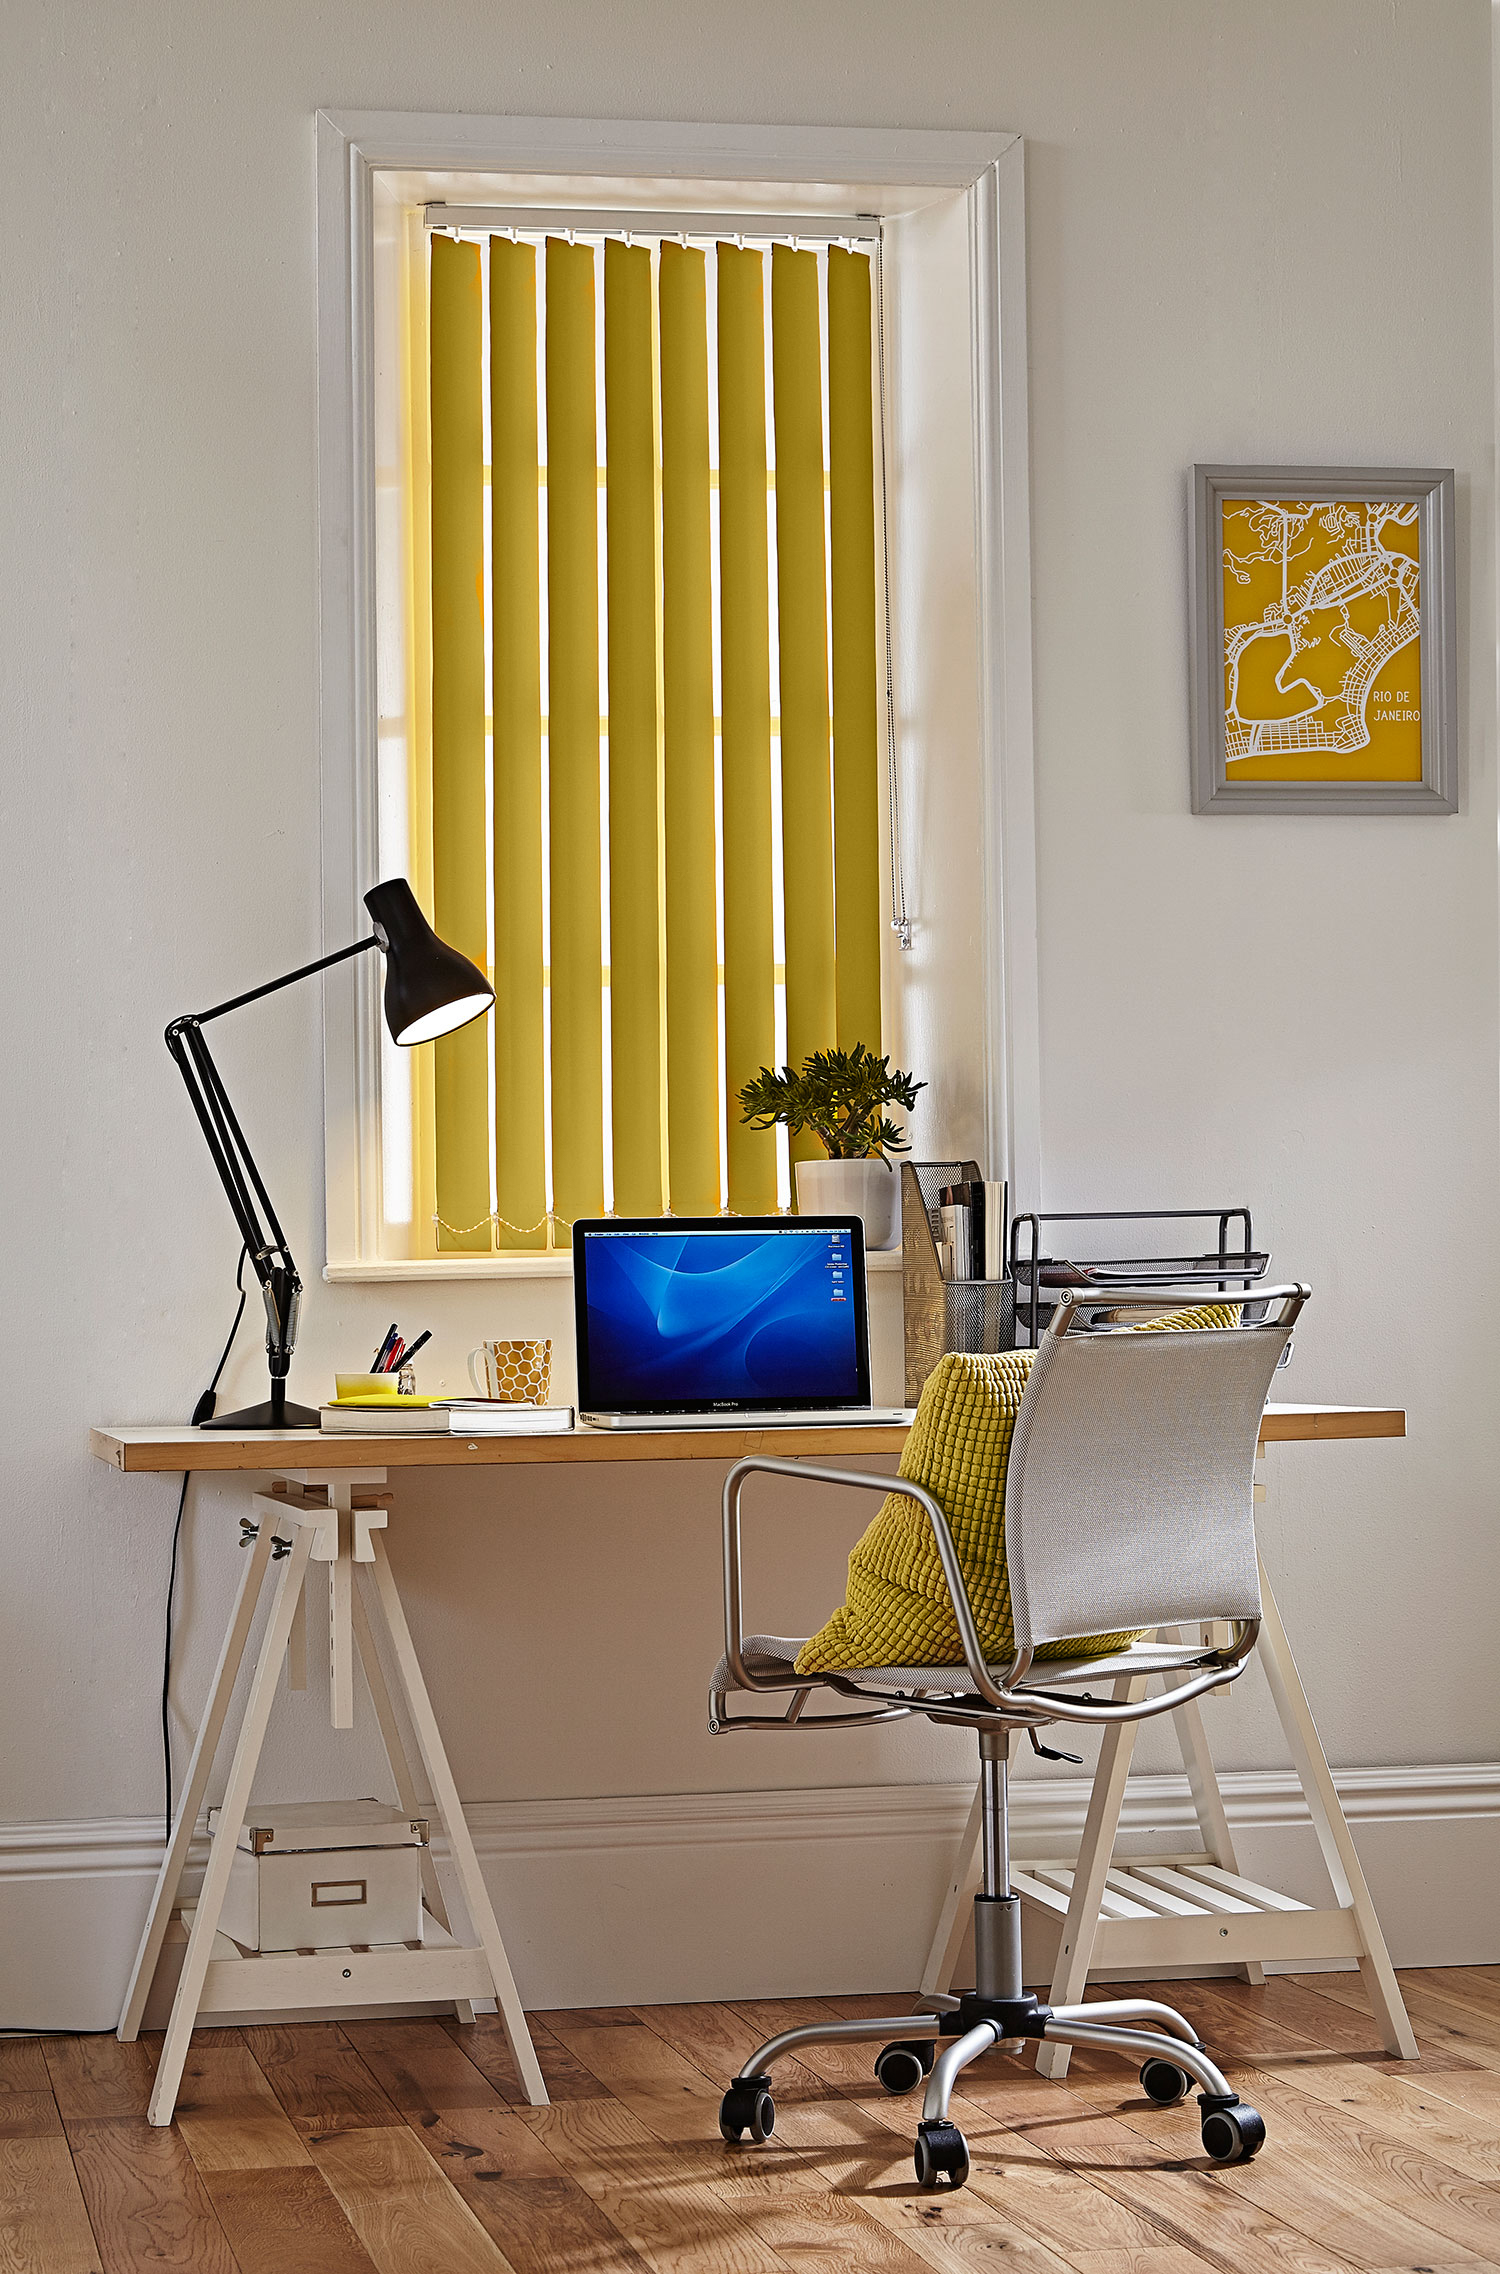 Polaris Gold vertical blind in an office